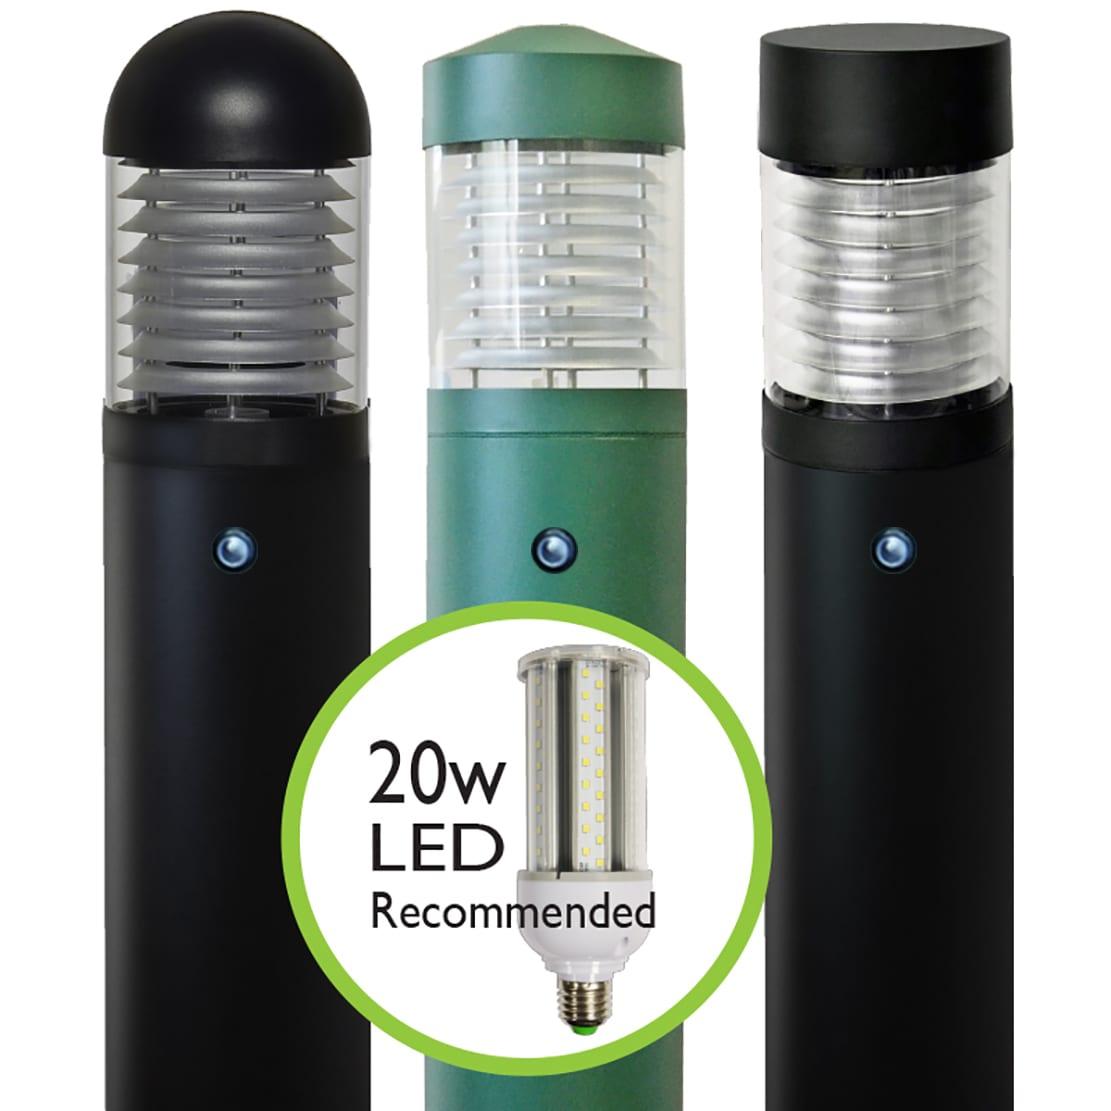 Ledifice Commercial Dusk To Dawn Led Bollard Lighting